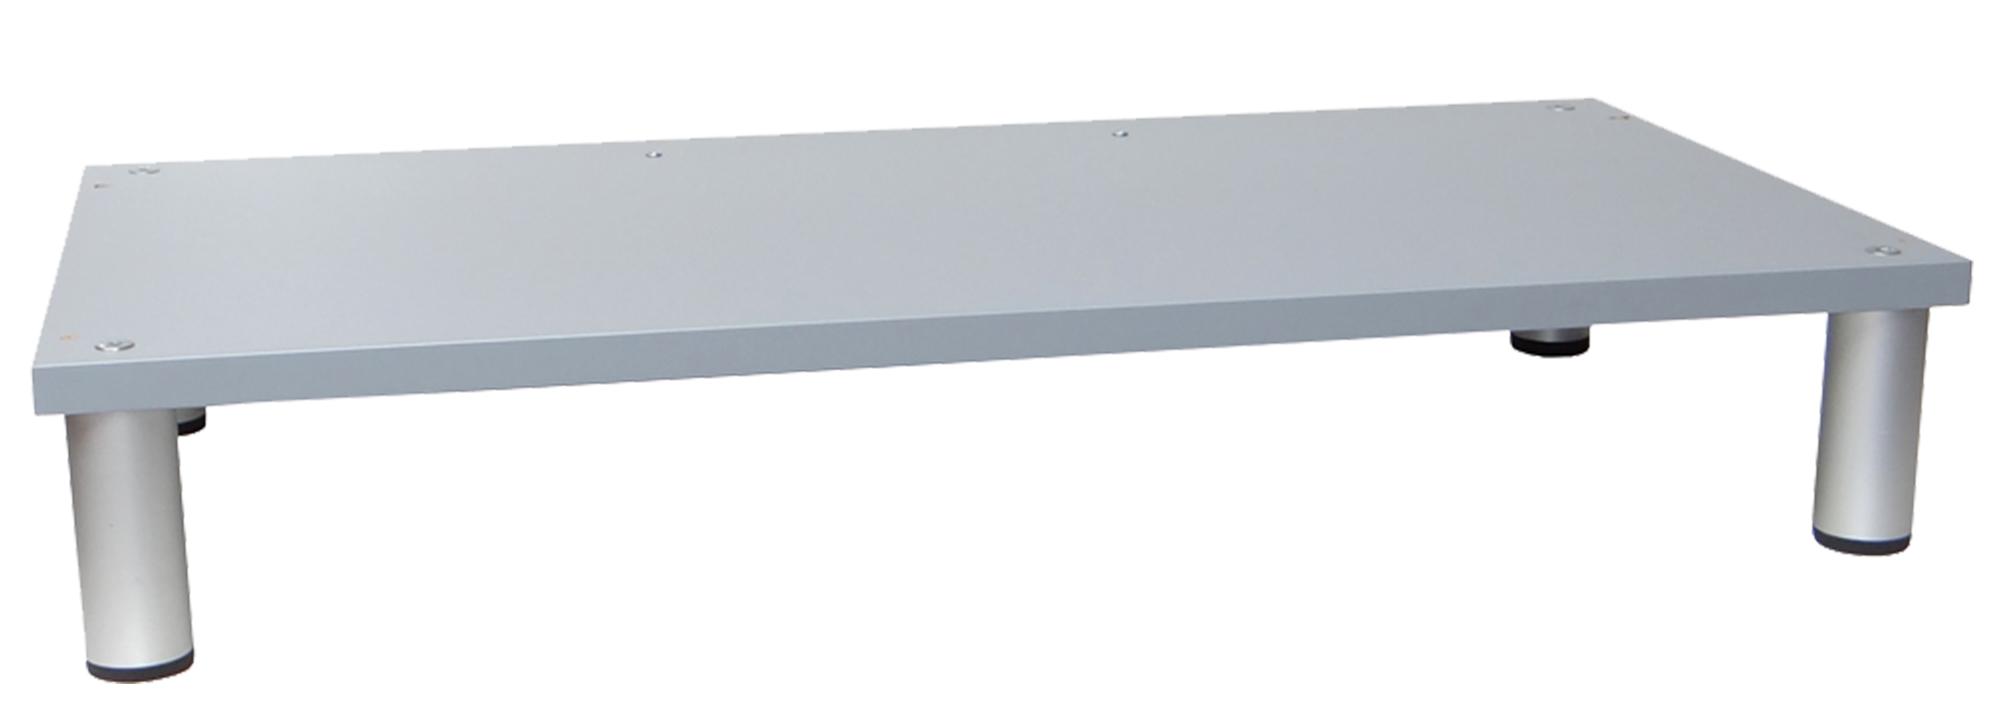 ikea effektiv sockel in grau auf alu f en 84cm. Black Bedroom Furniture Sets. Home Design Ideas